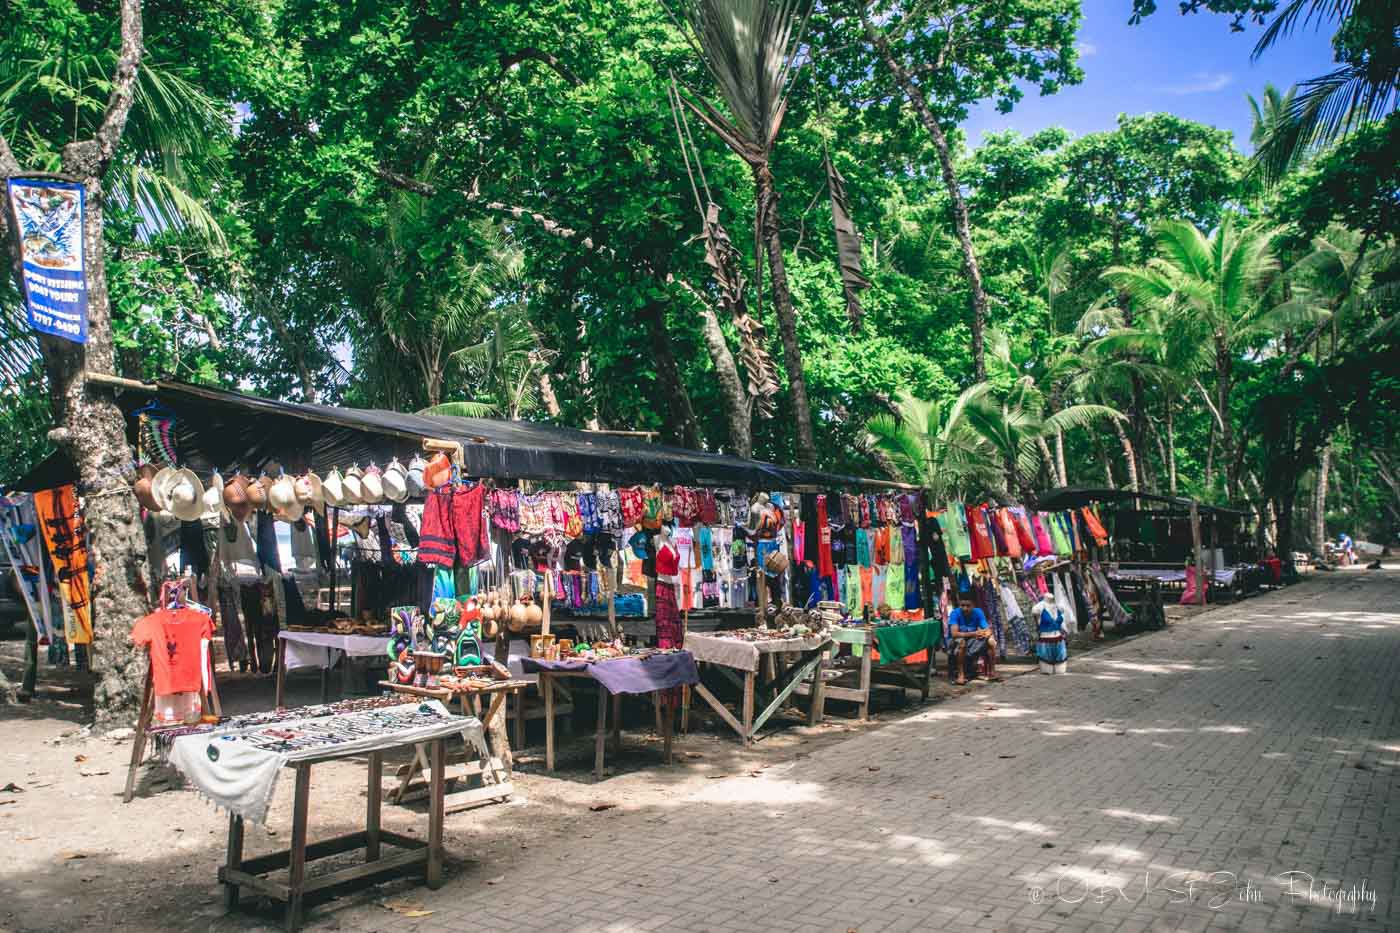 Beach side market in Playa Dominical. Costa Ballena, Costa Rica